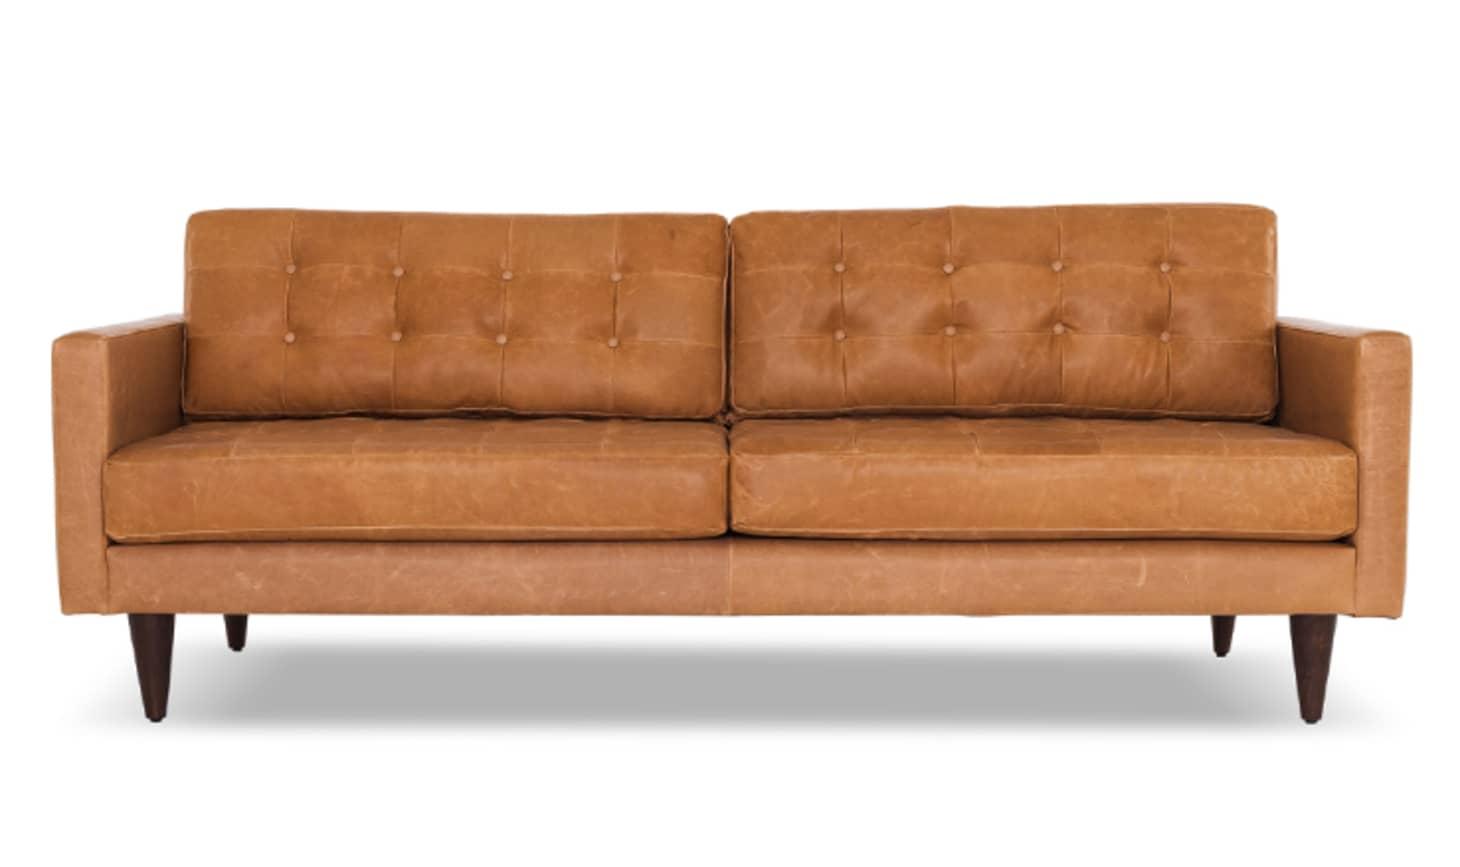 Astonishing Joybird Leather Sofa Review Beatyapartments Chair Design Images Beatyapartmentscom